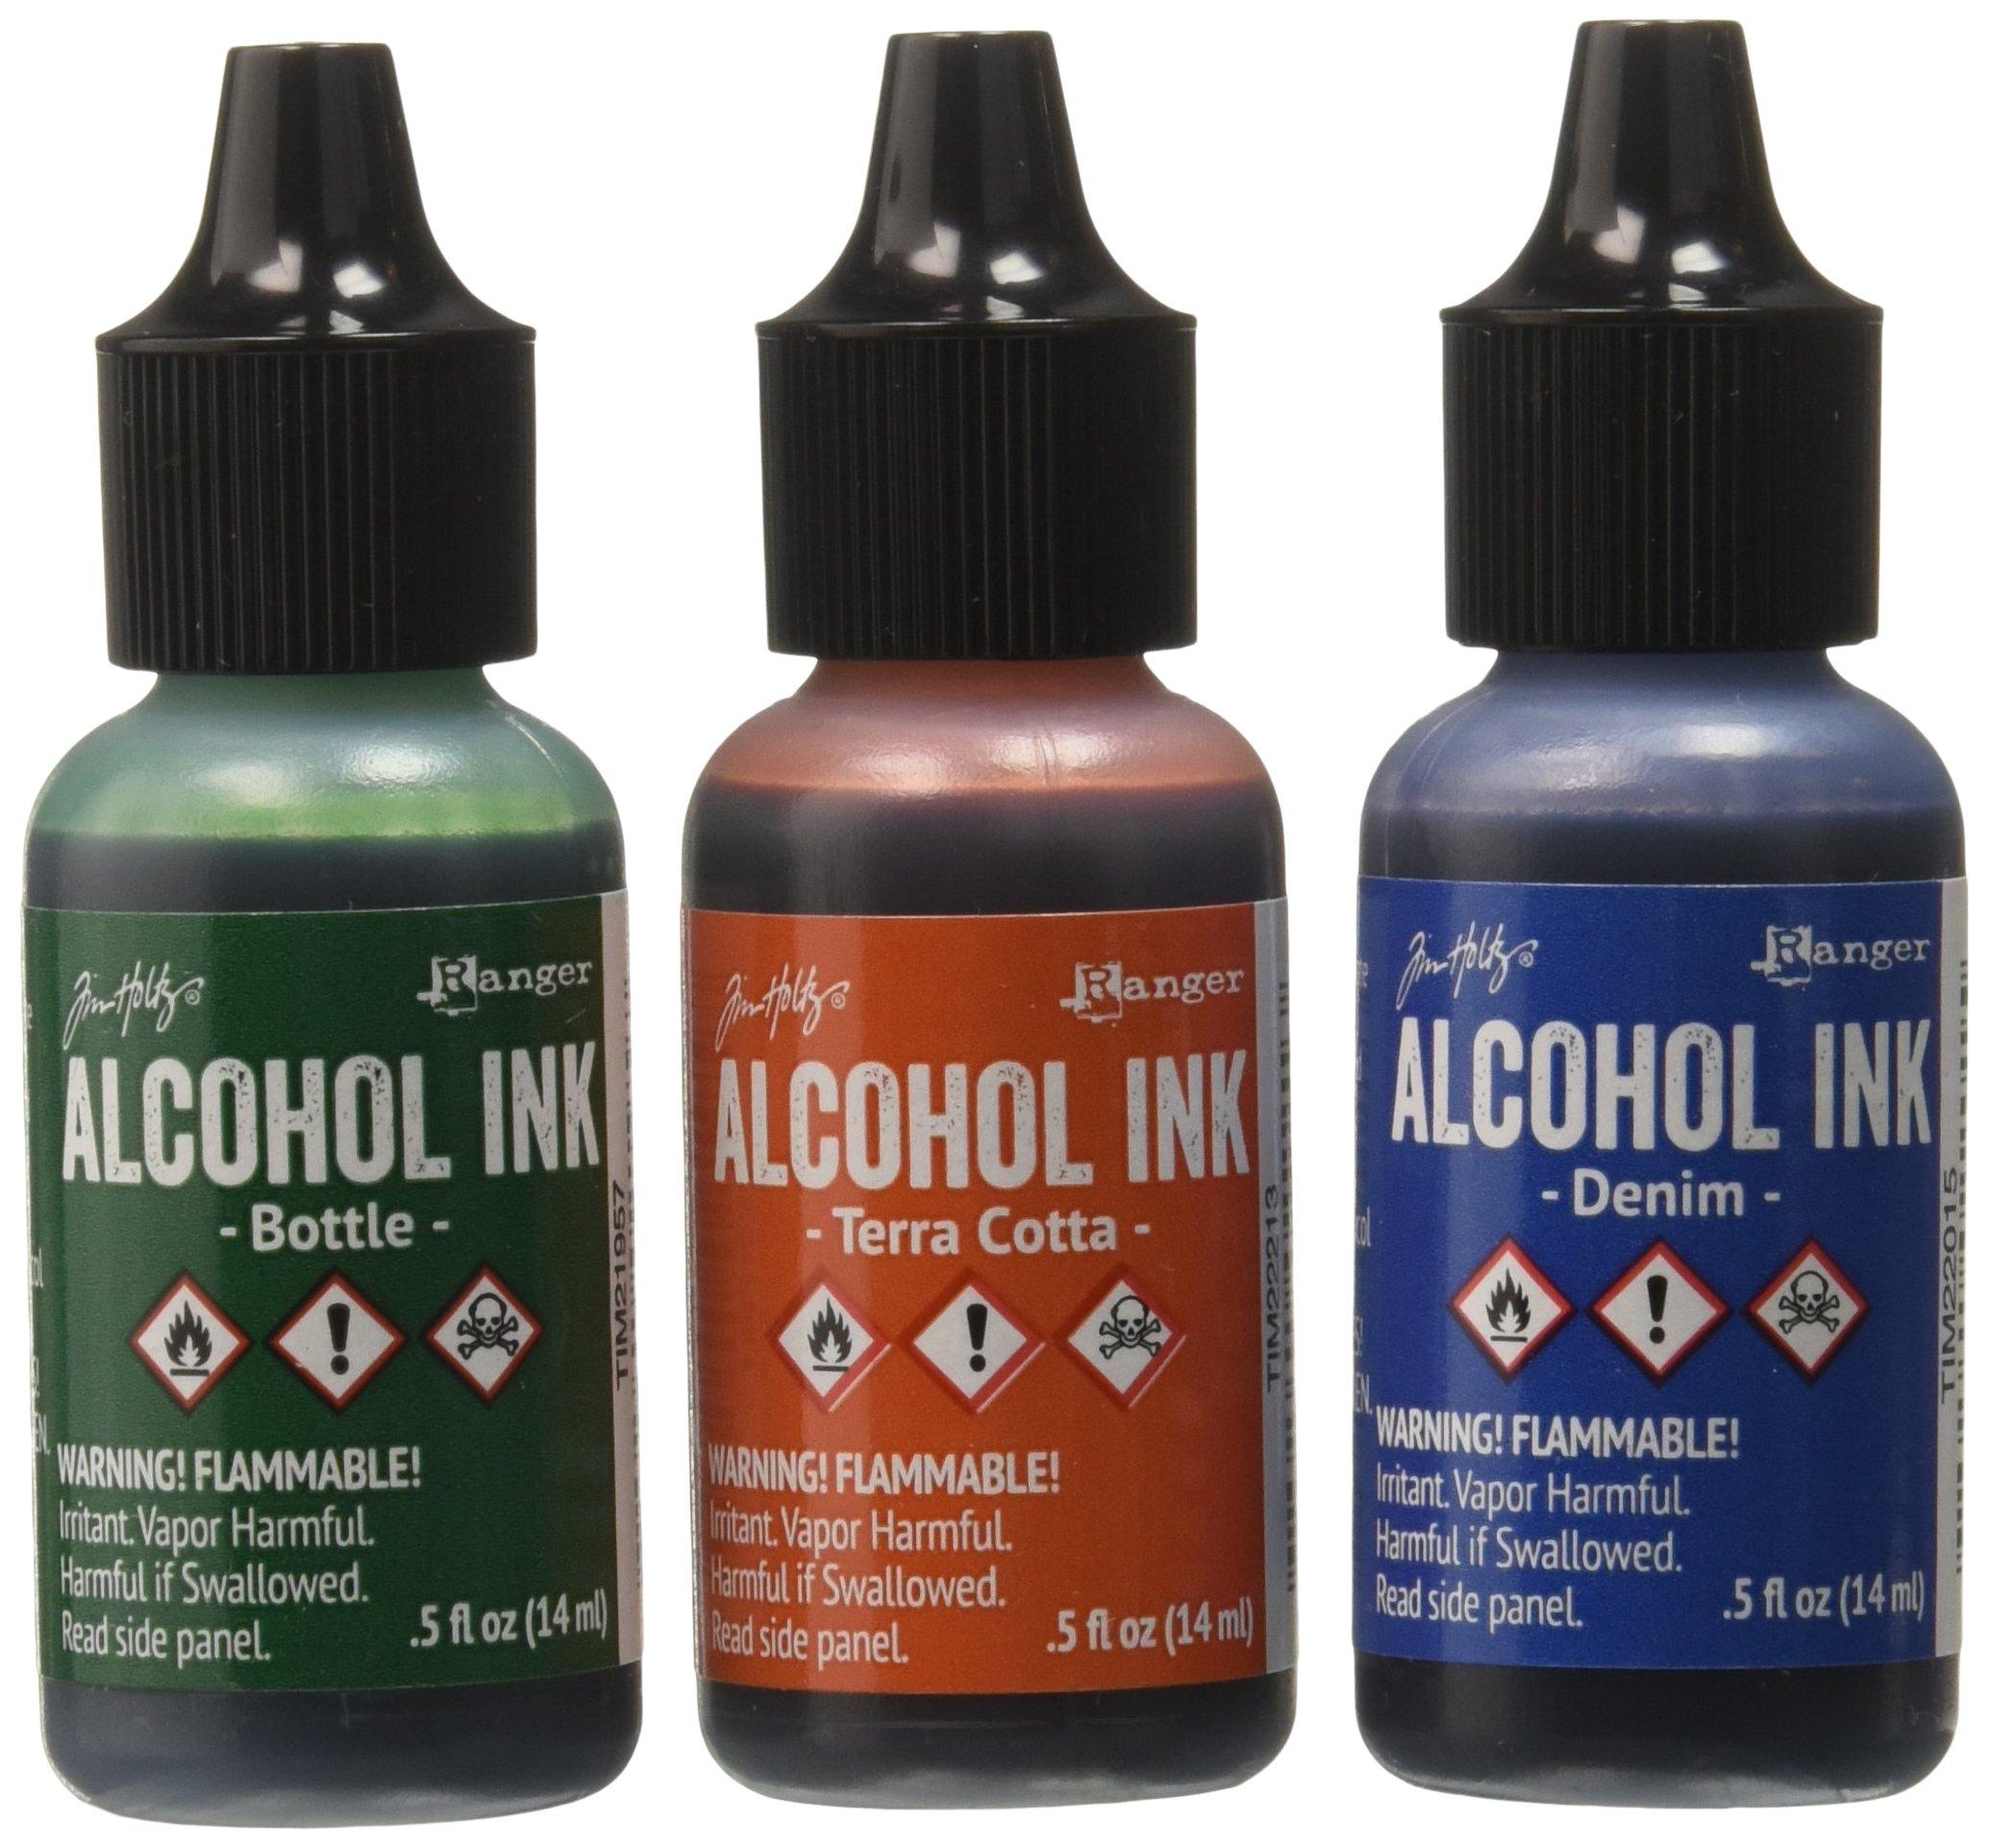 Ranger Adirondack Alcohol Ink 1/2-Ounce, 3-Pack, Rustic Lodge, Bottle/Terra Cotta/Denim by Ranger